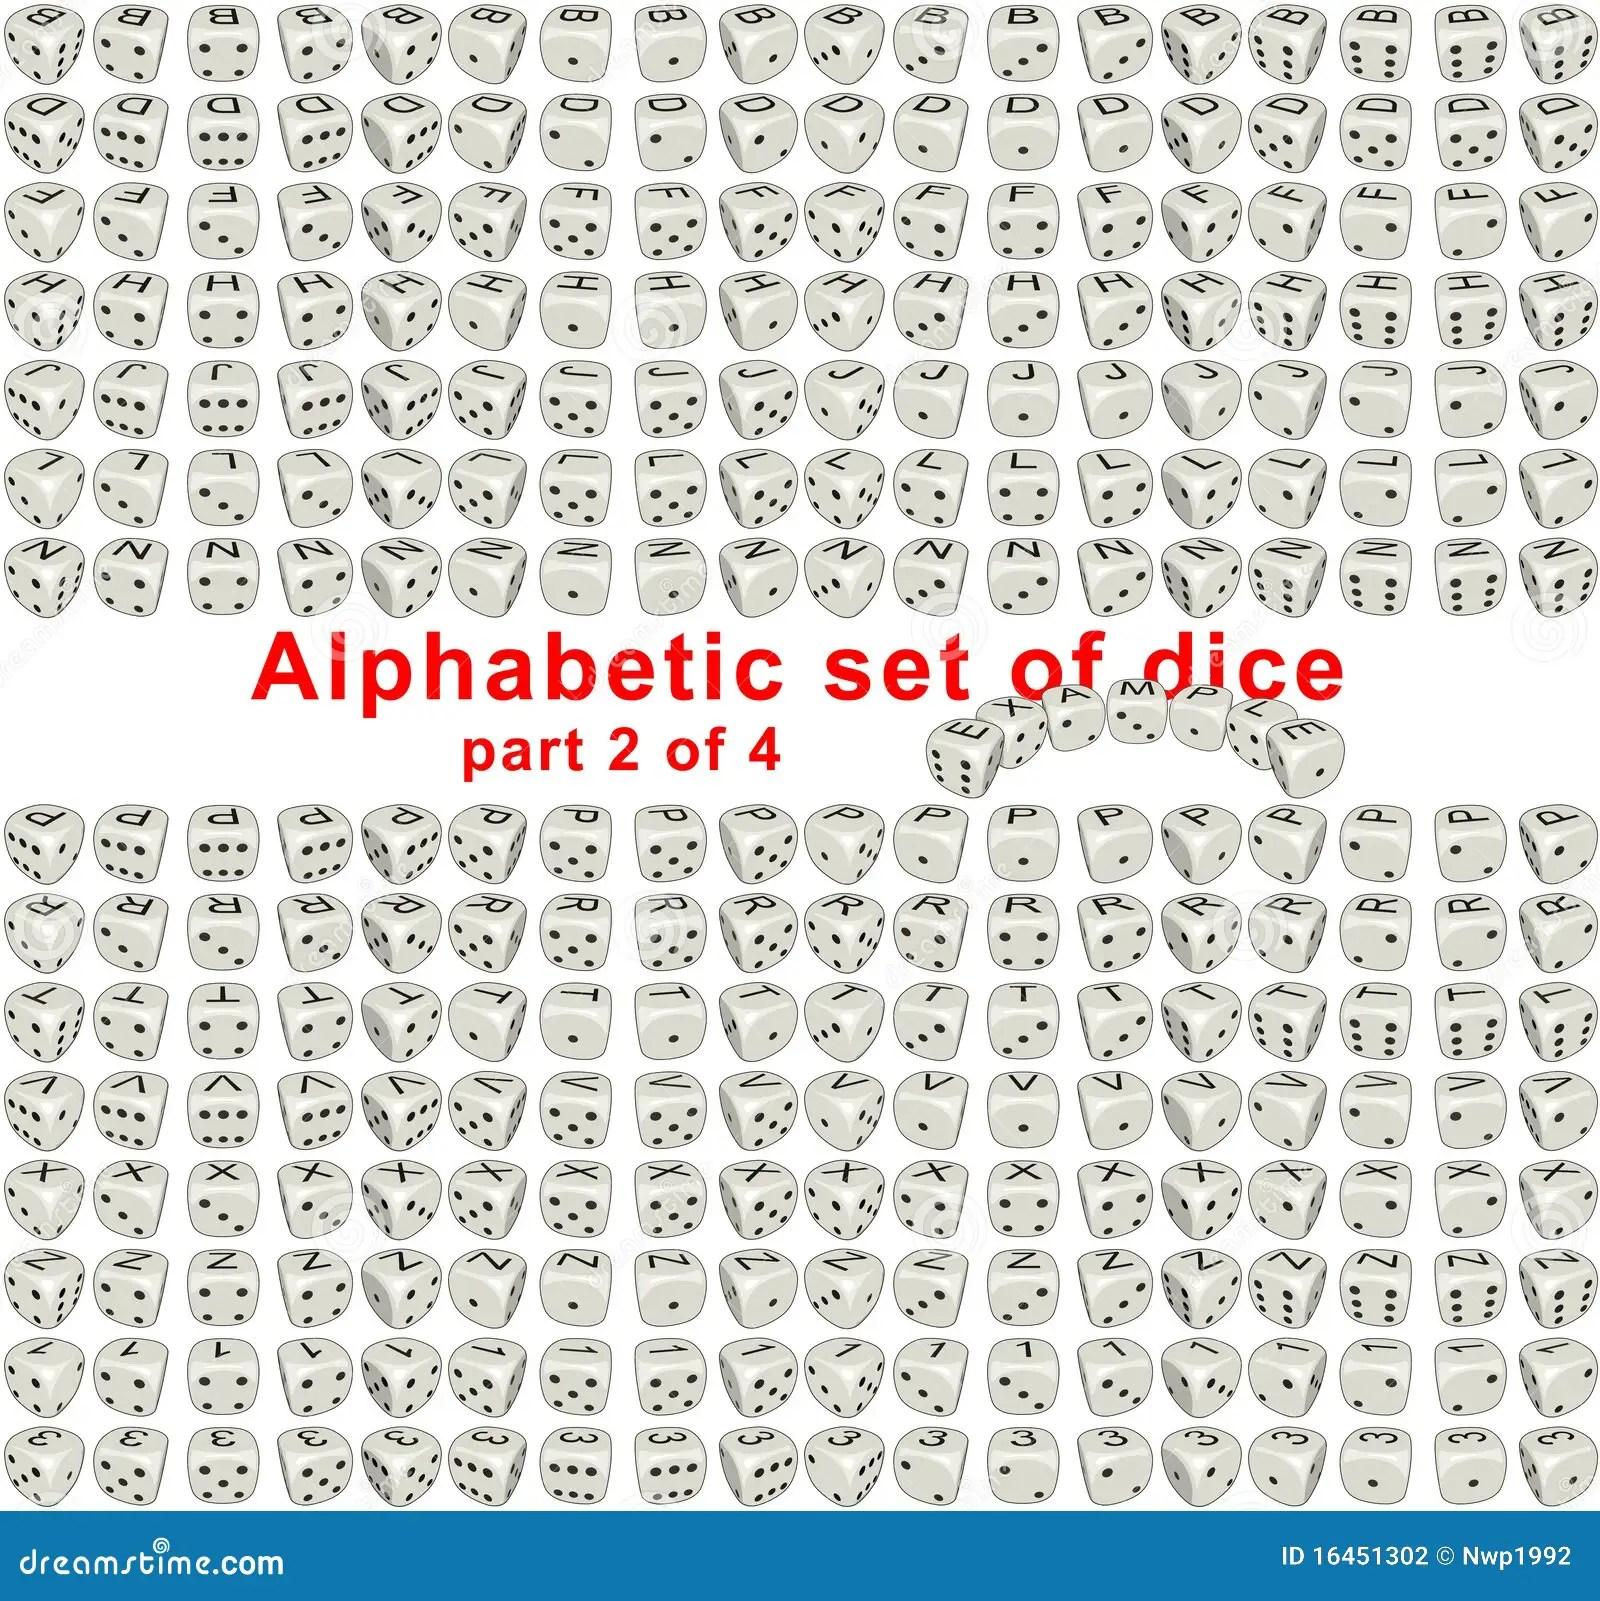 Alphabet Dice Part 2 Of 4 Stock Illustration